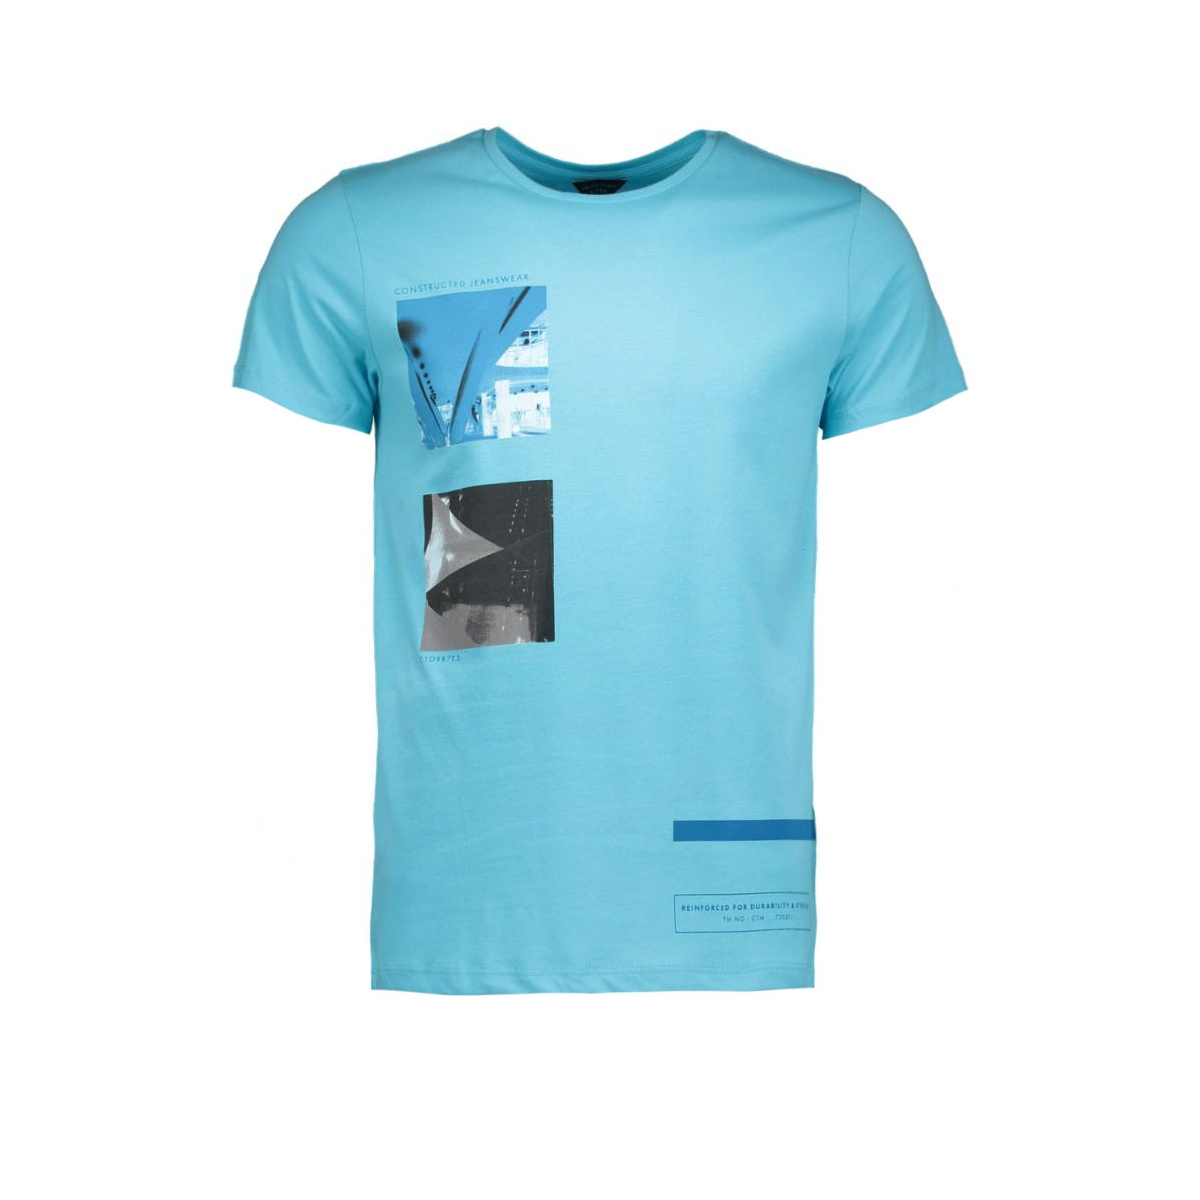 jcoguru tee 12105953 jack & jones t-shirt capri